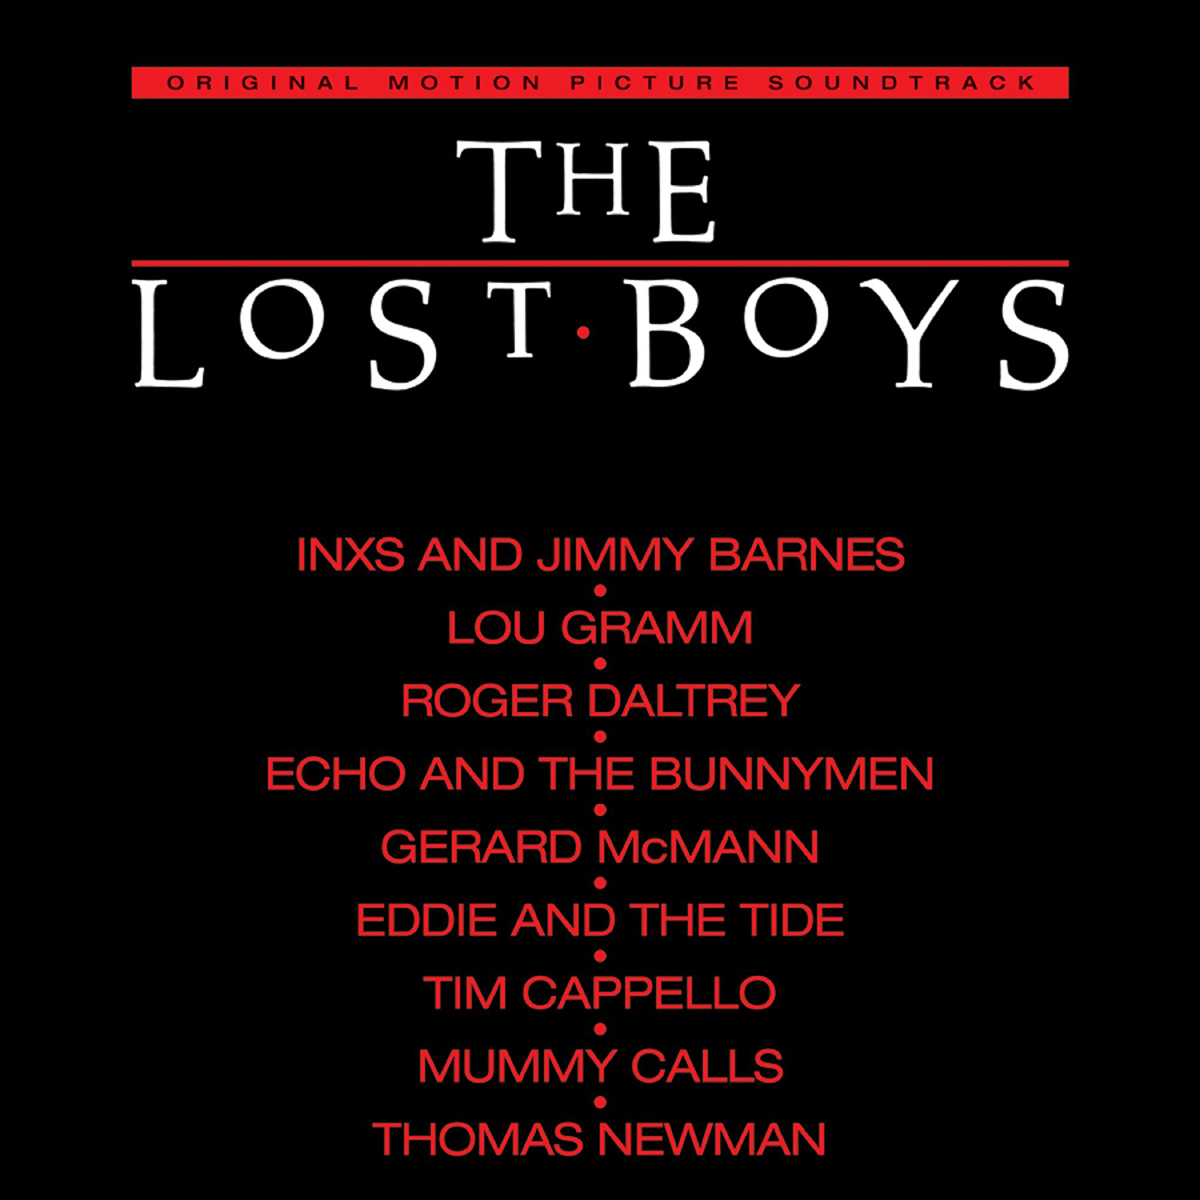 THE LOST BOYS - THE LOST BOYS-ORIGINAL SOUNDTRACK RECORDING 180 GRAM RED AUDIOPHILE LP